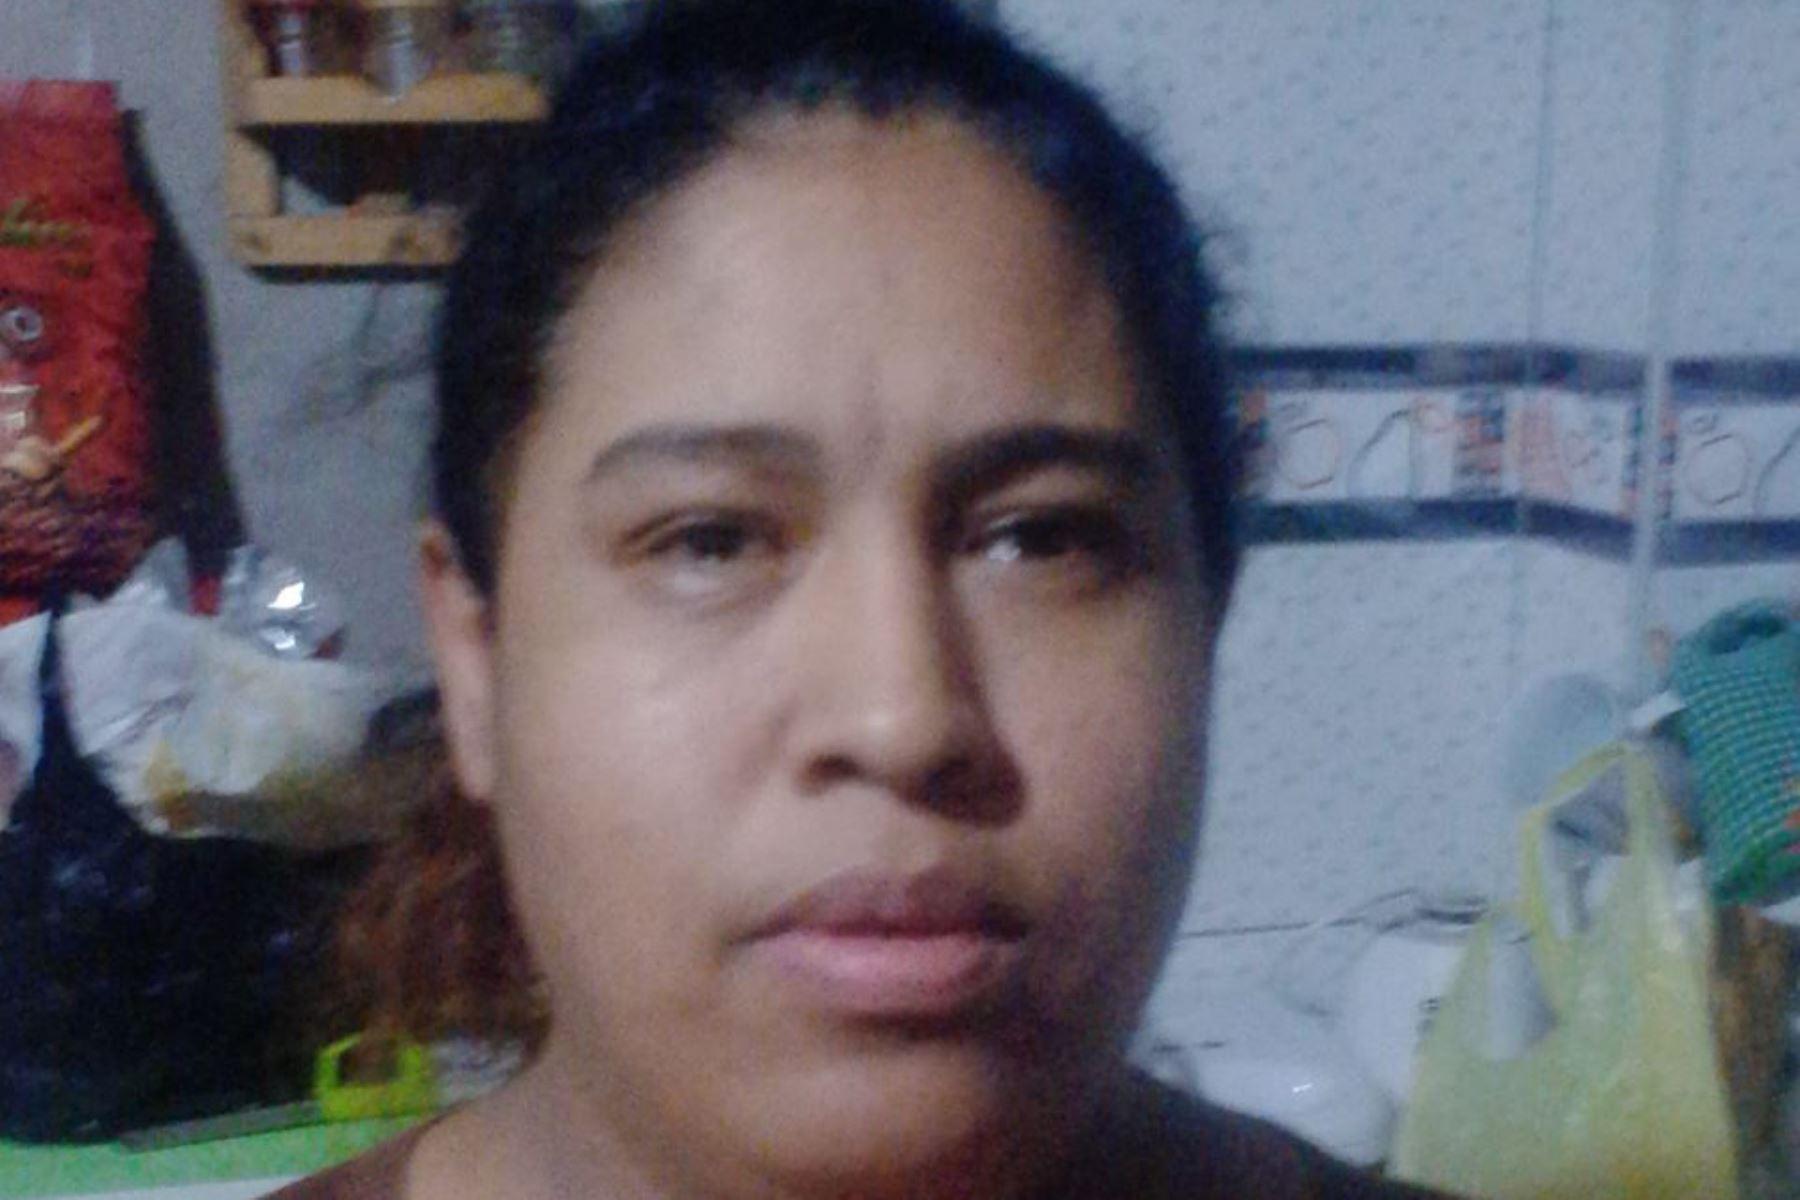 Ingrid Arizaga Barandin, víctima de feminicidio. Foto: Facebook